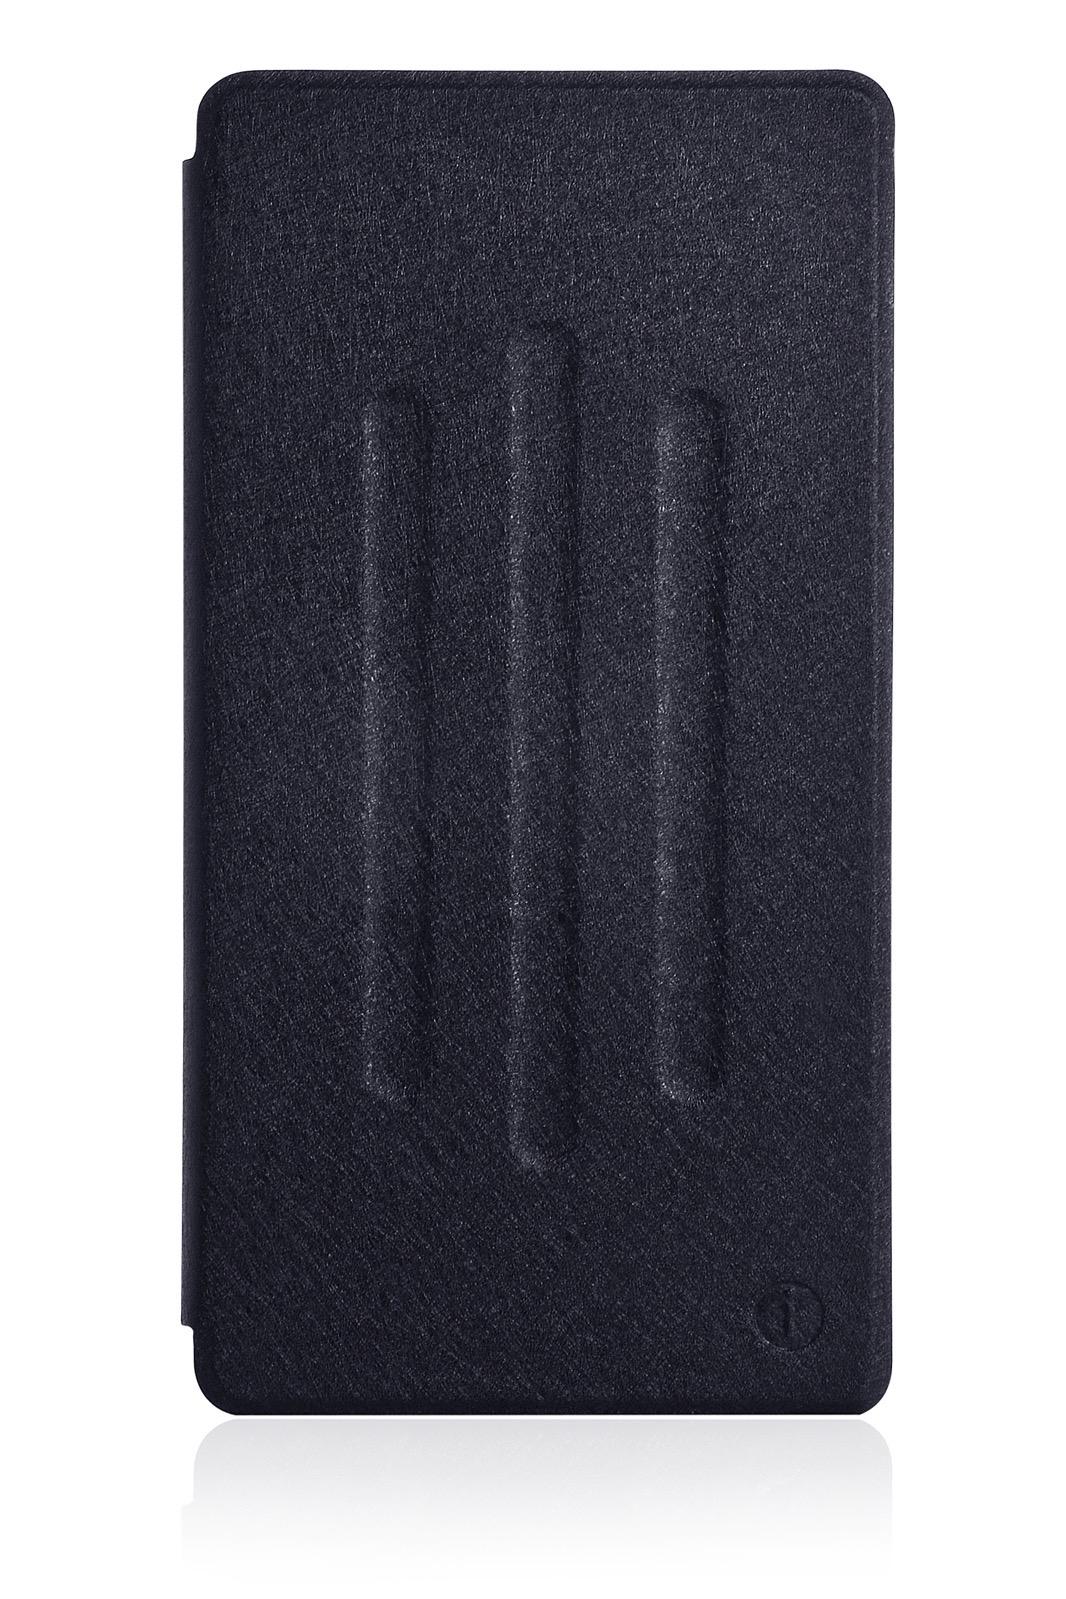 Чехол для планшета iNeez книжка Lenovo Tab 4 TB-7504 7.0, черный